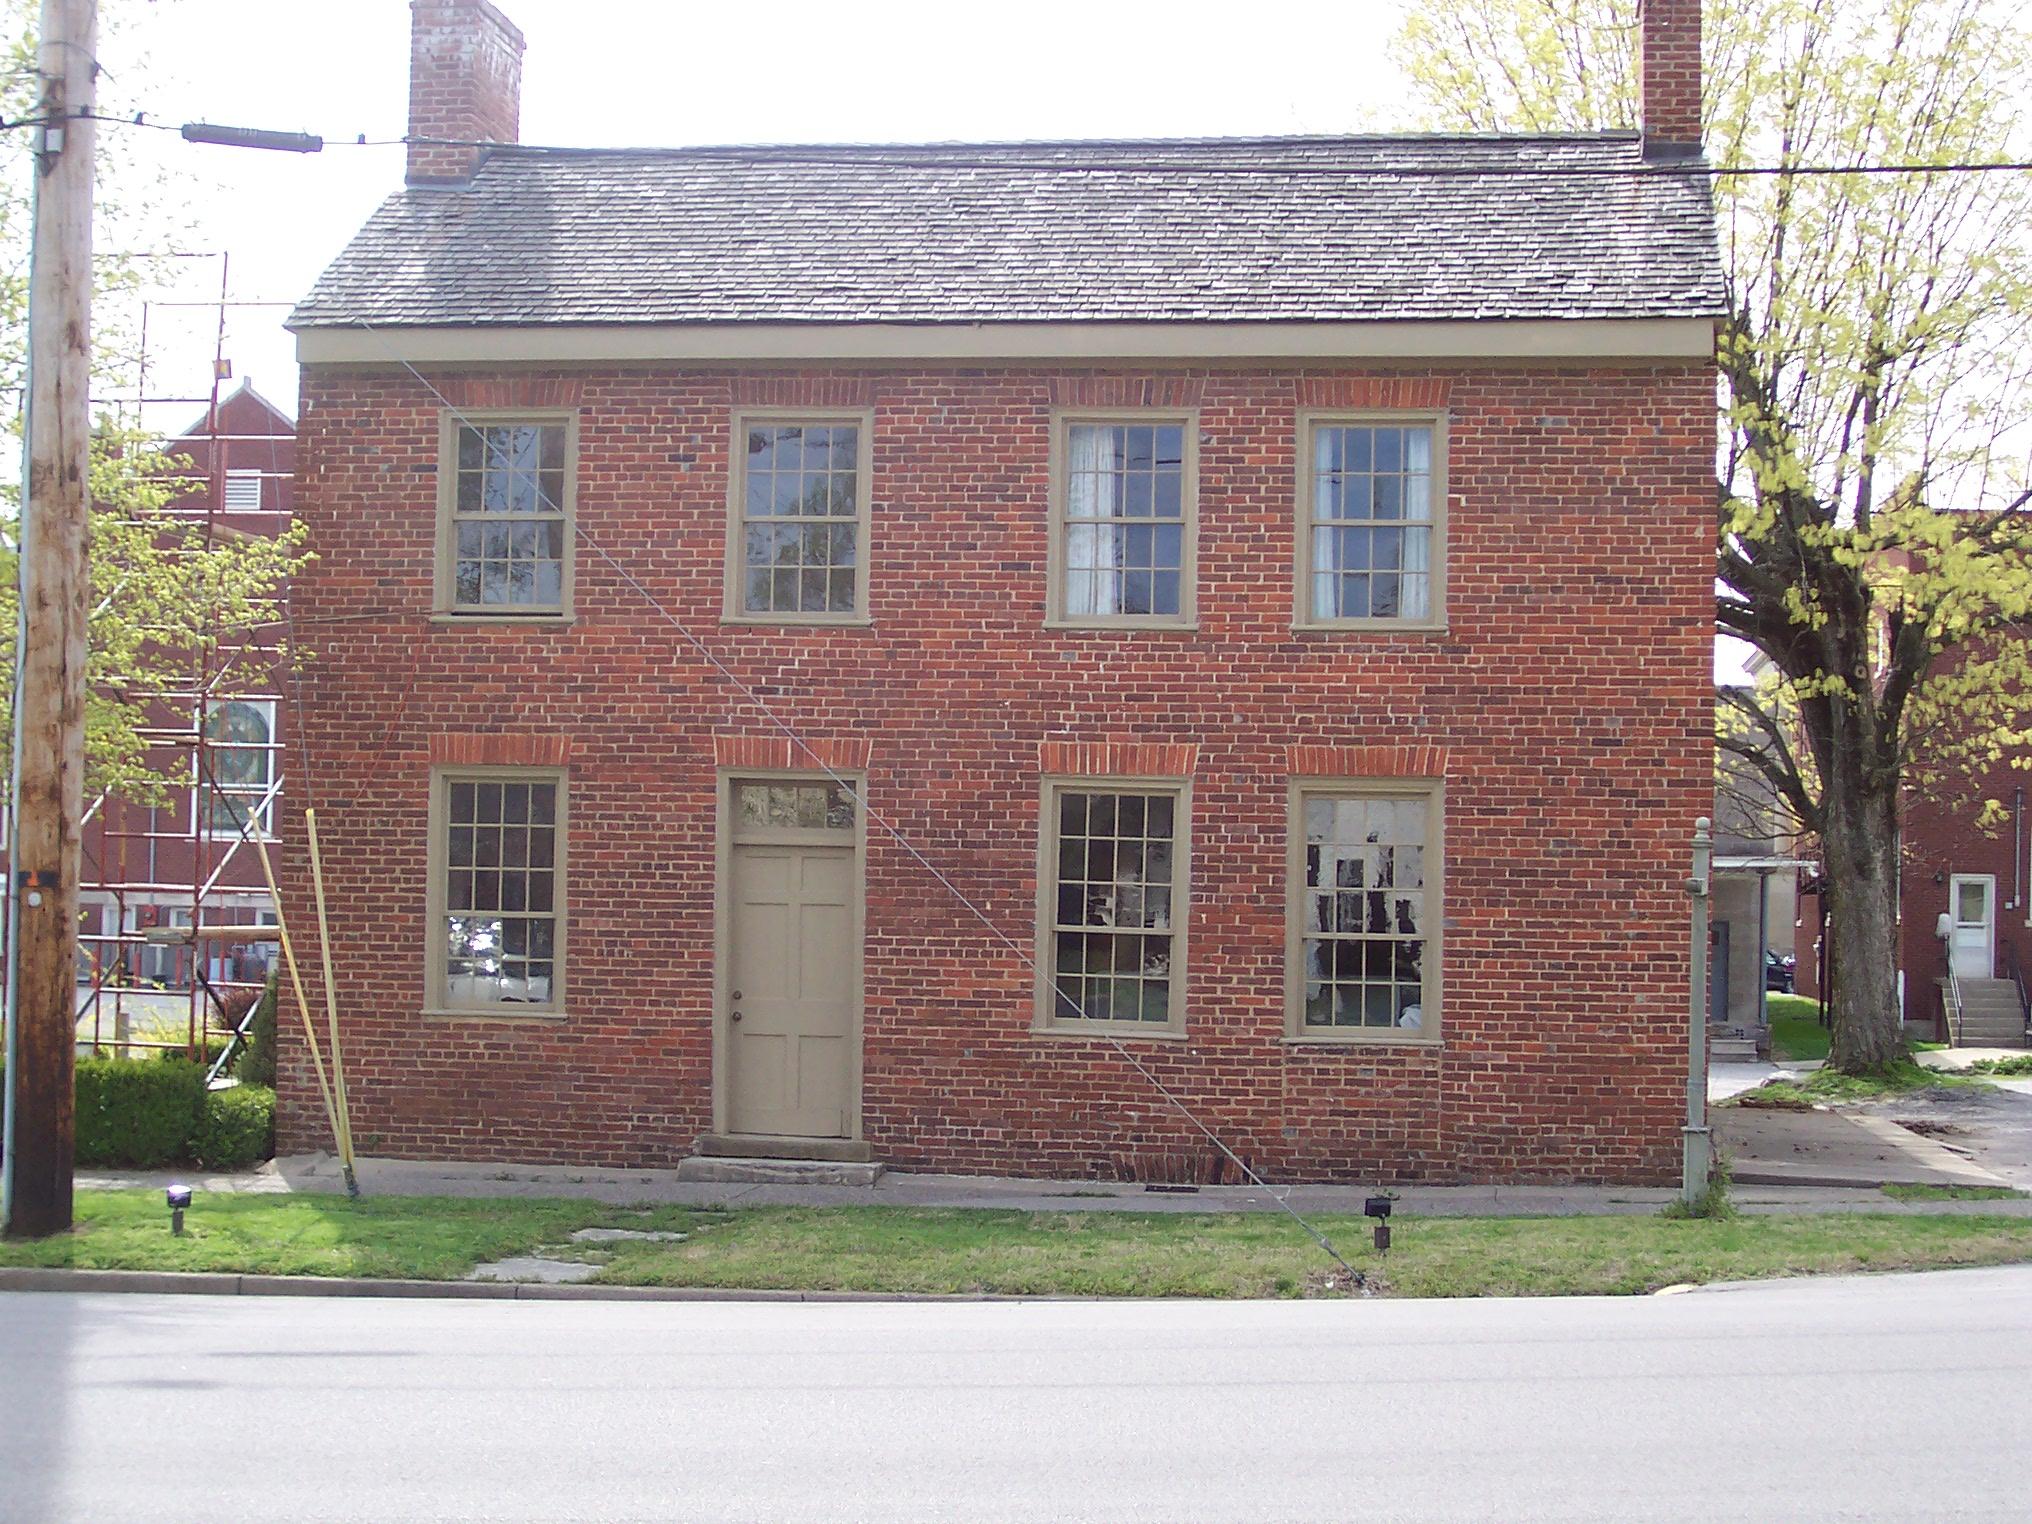 File:Posey House.jpg - Wikimedia Commons